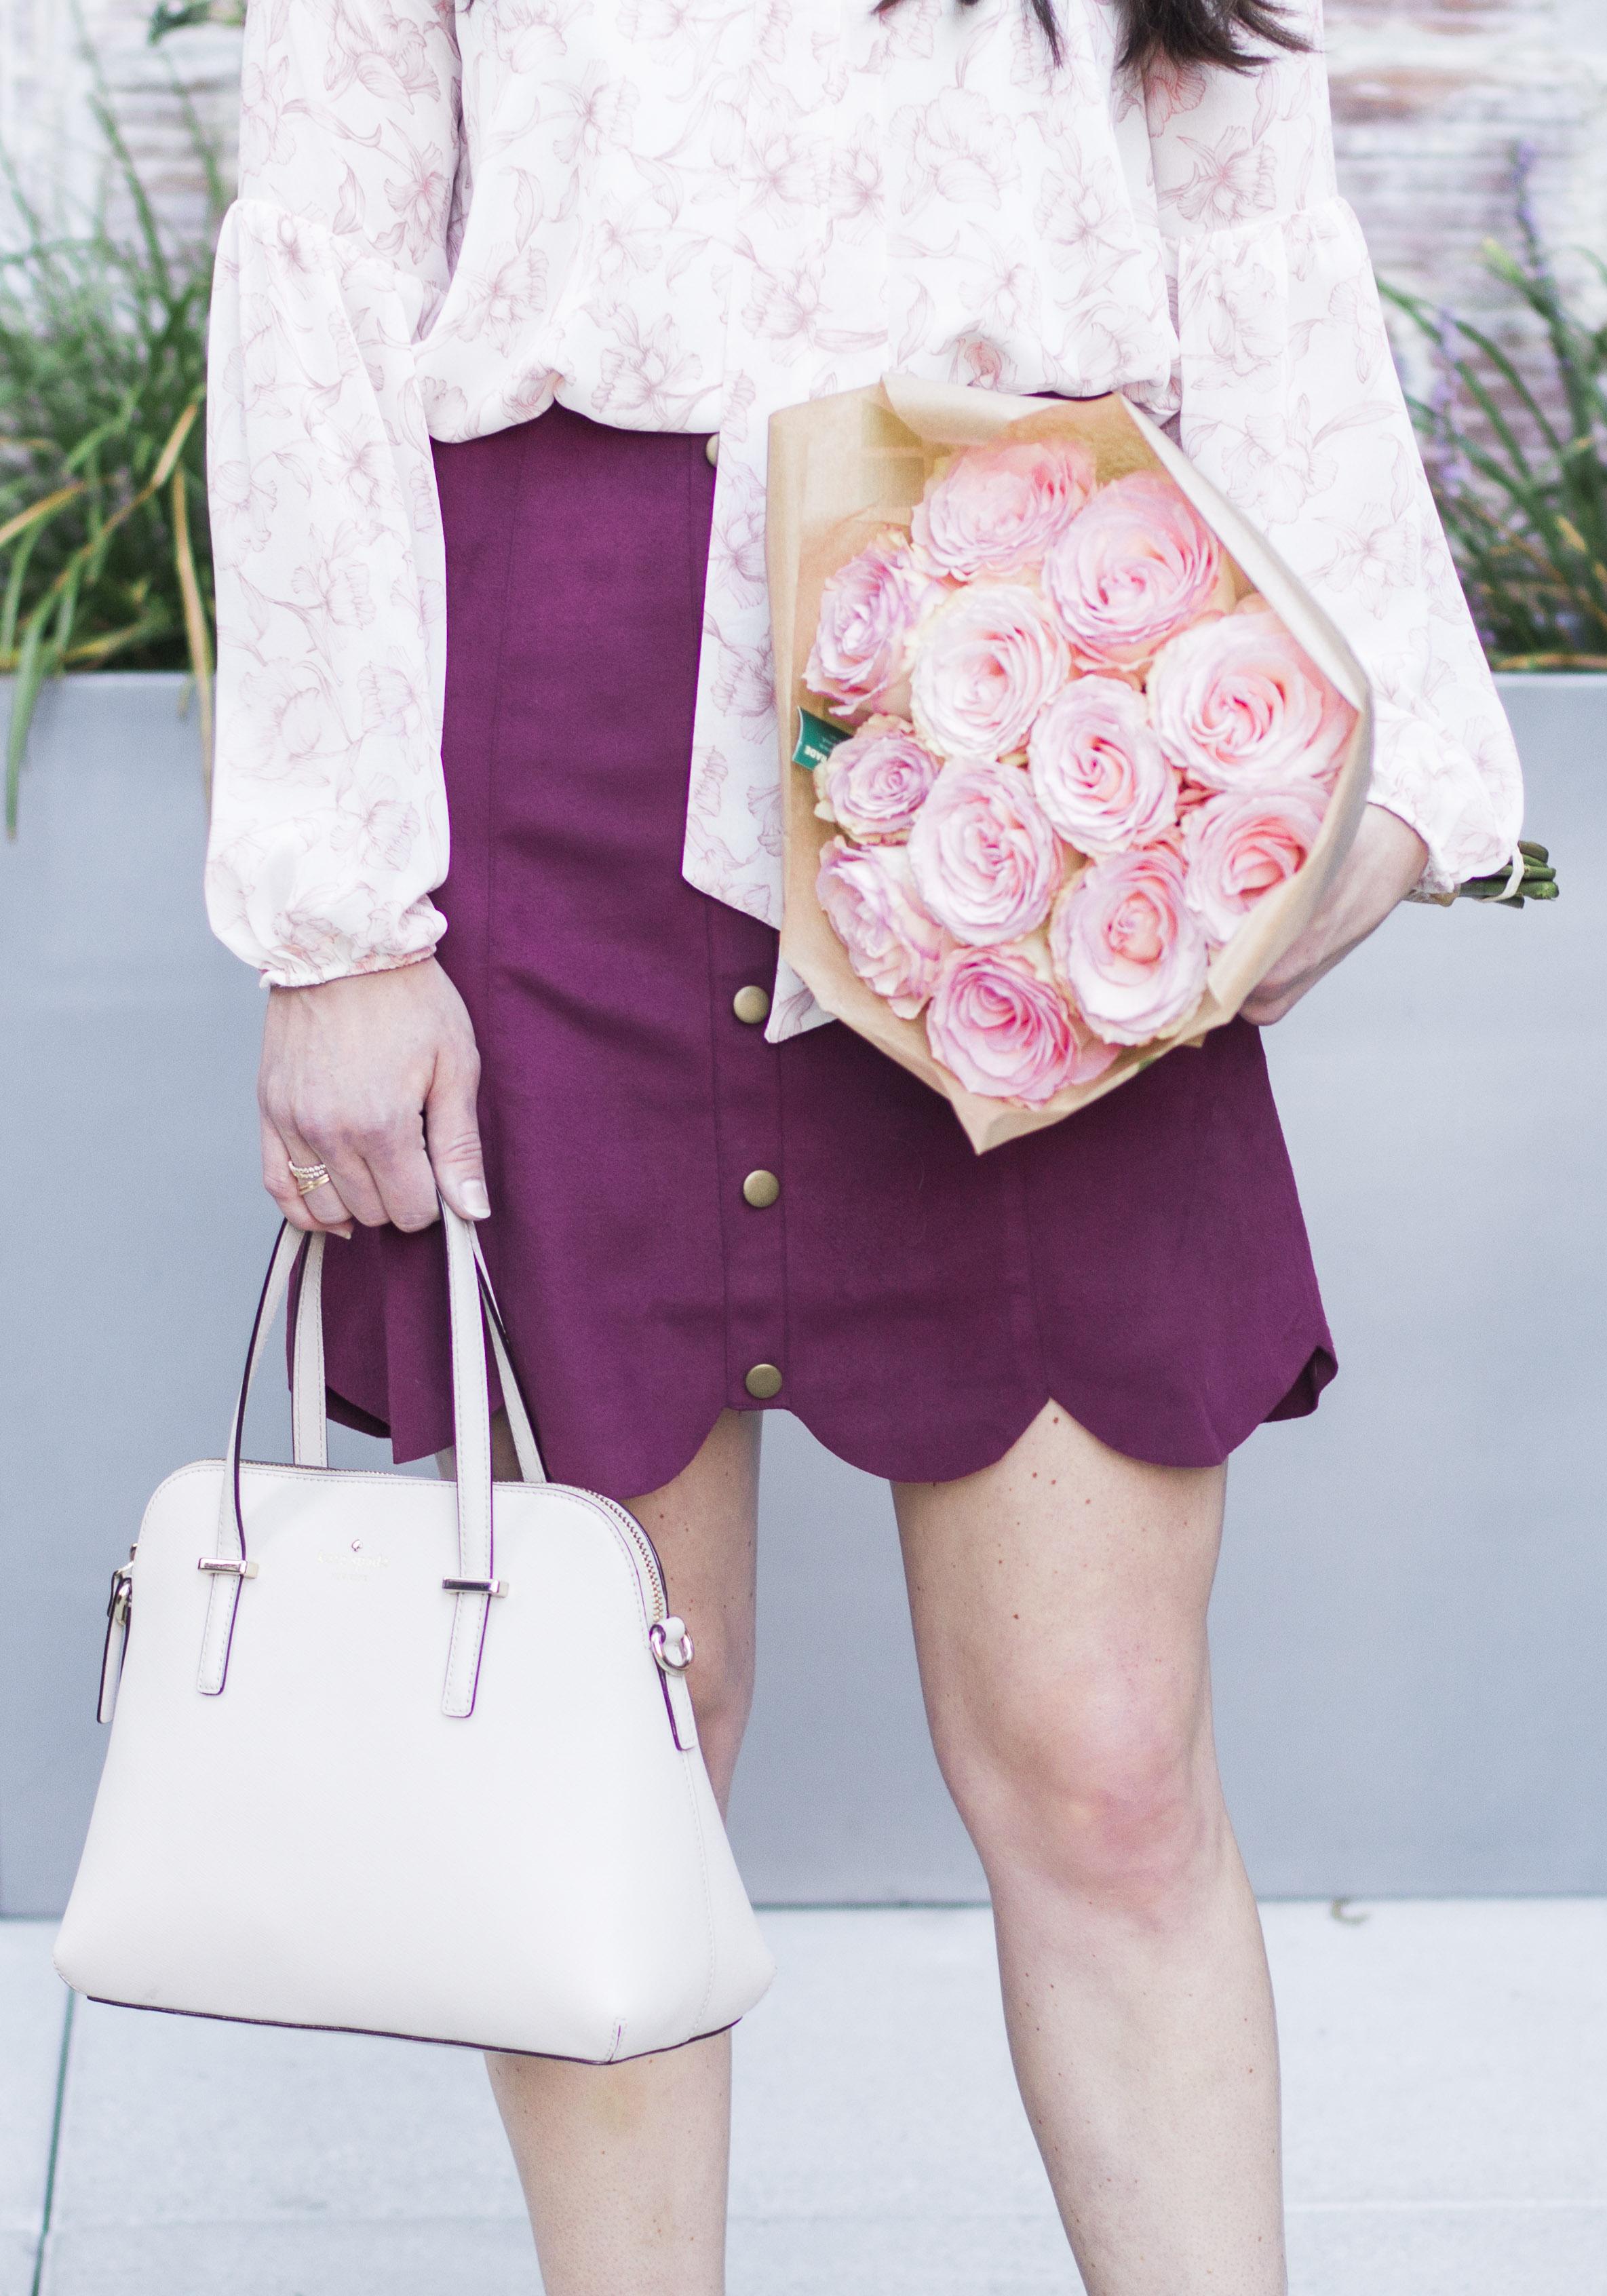 Cute fall outfits for work, Lush Print Tie Neck Blouse, LC Lauren Conrad Faux Suede Skirt, Sam Edelman Helaine Ghillie Pumps, Kate Spade Cedar Street Maise